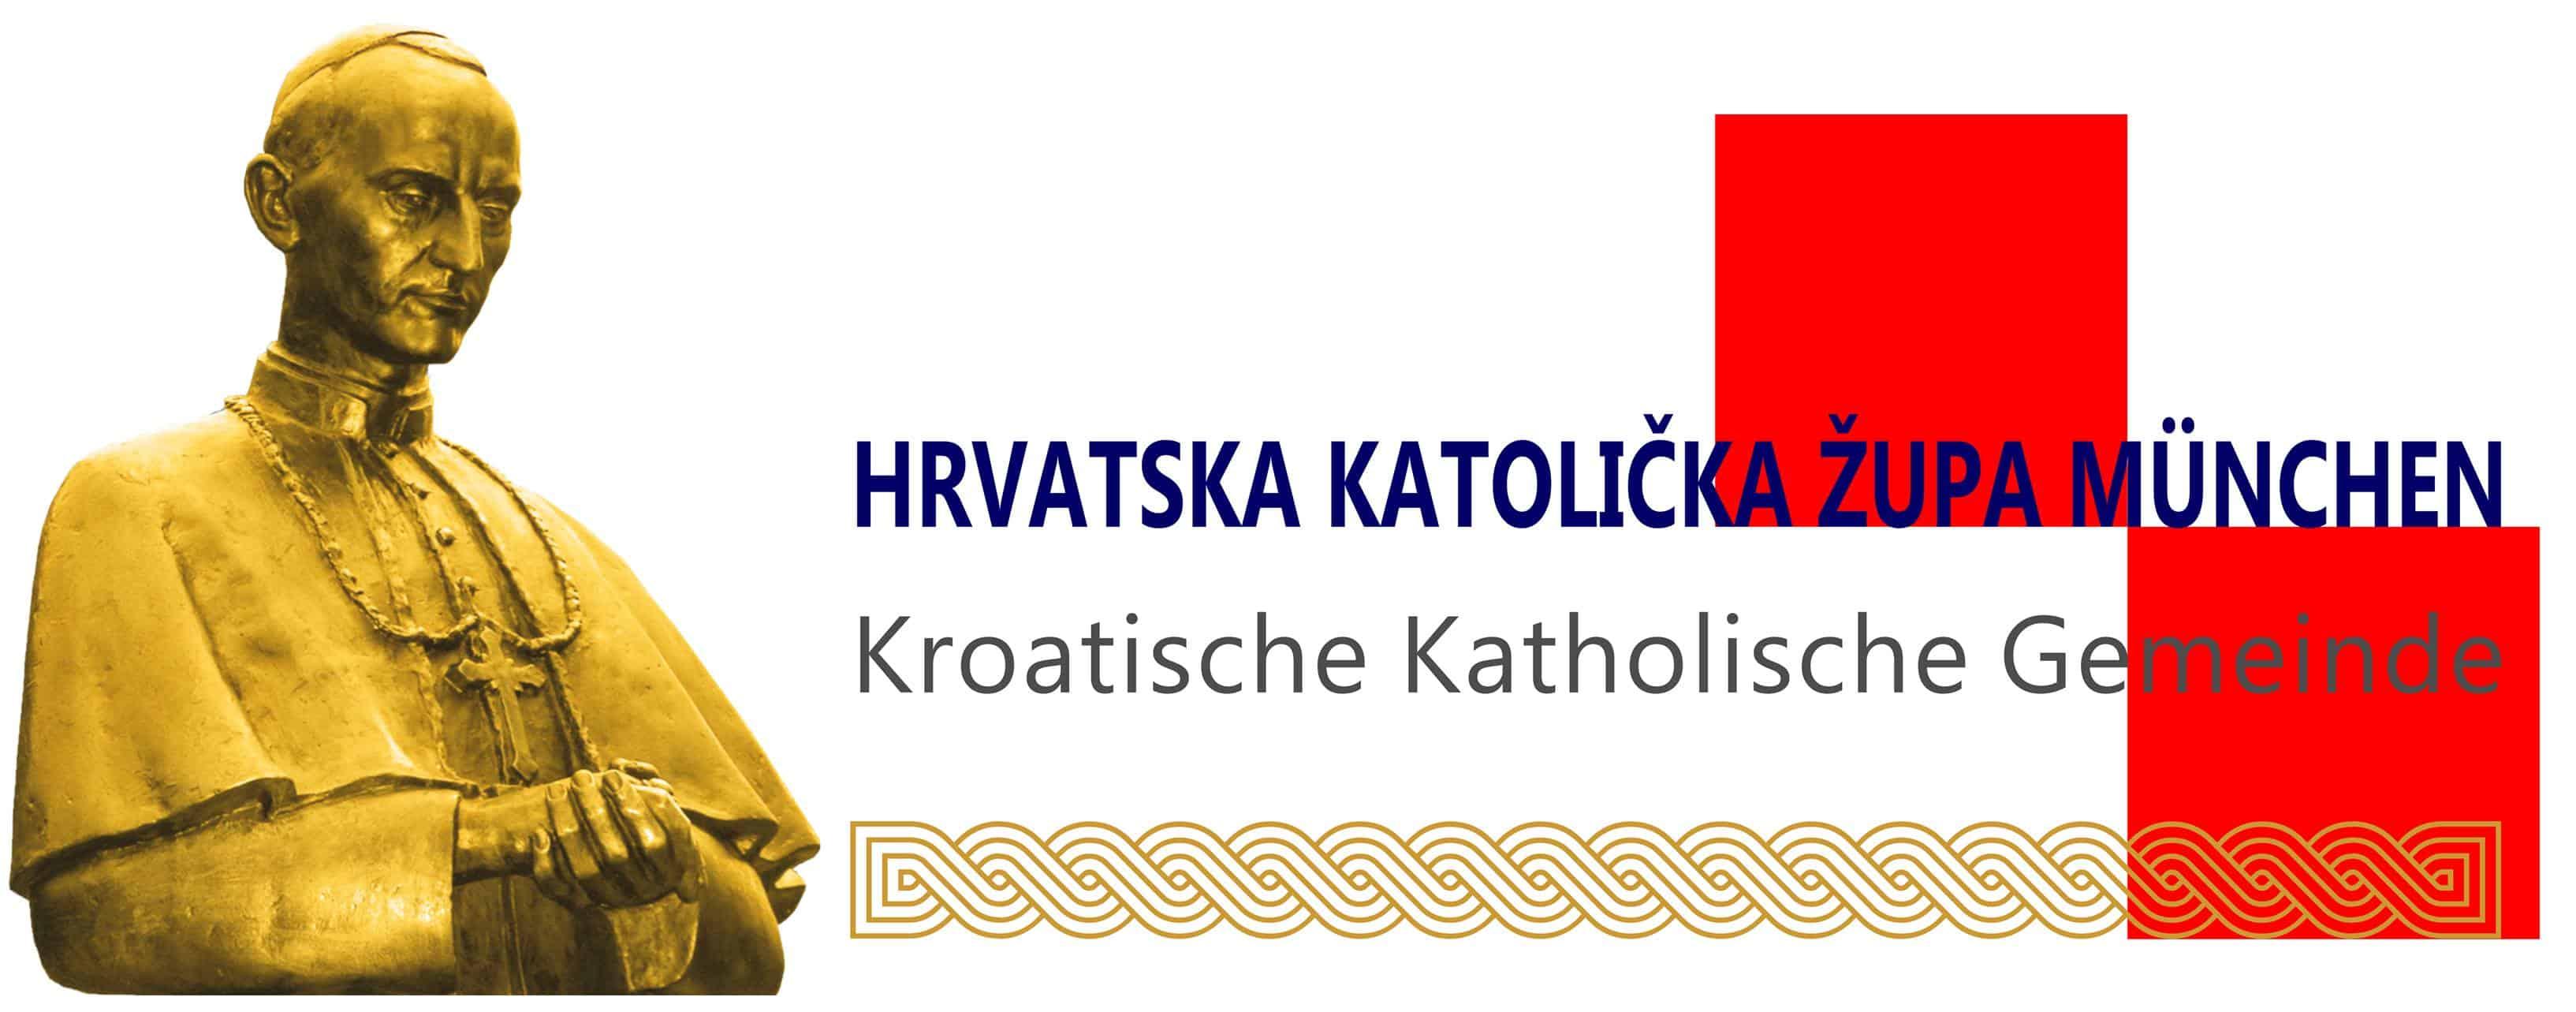 Hrvatska katolička župa München – Župni ured